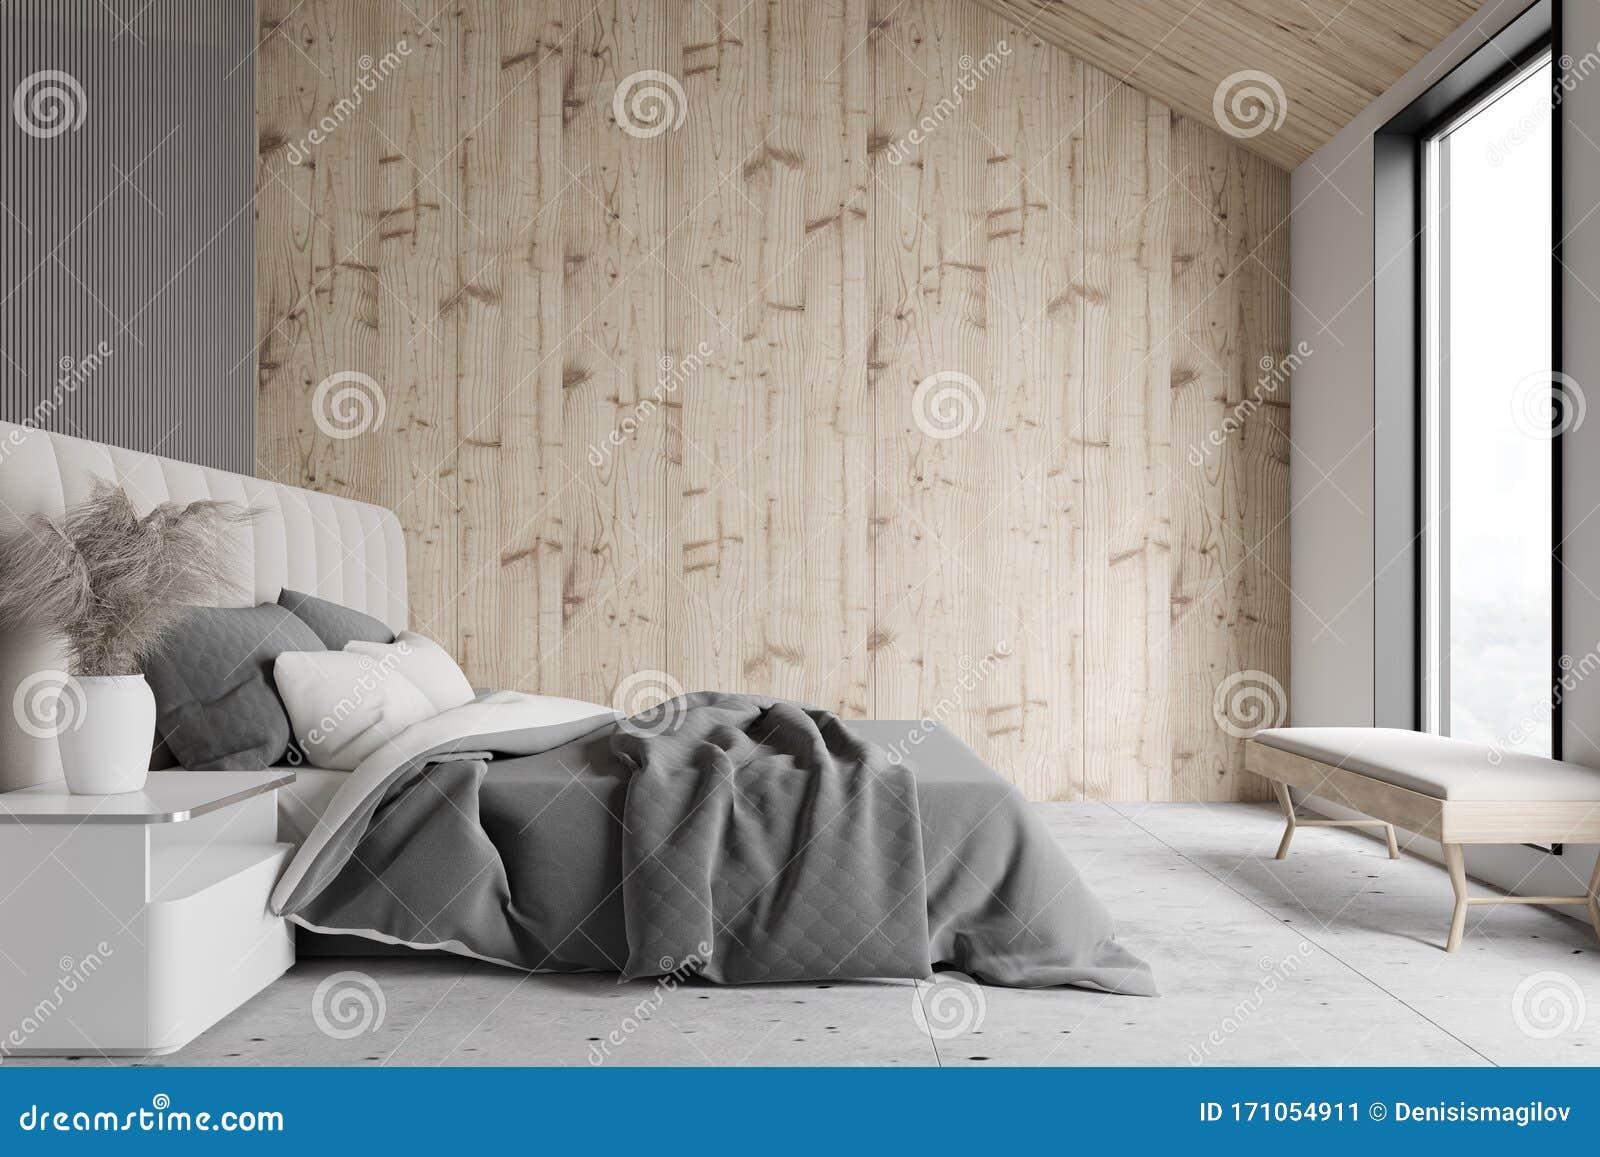 Wooden And Gray Attic Bedroom Interior Stock Illustration